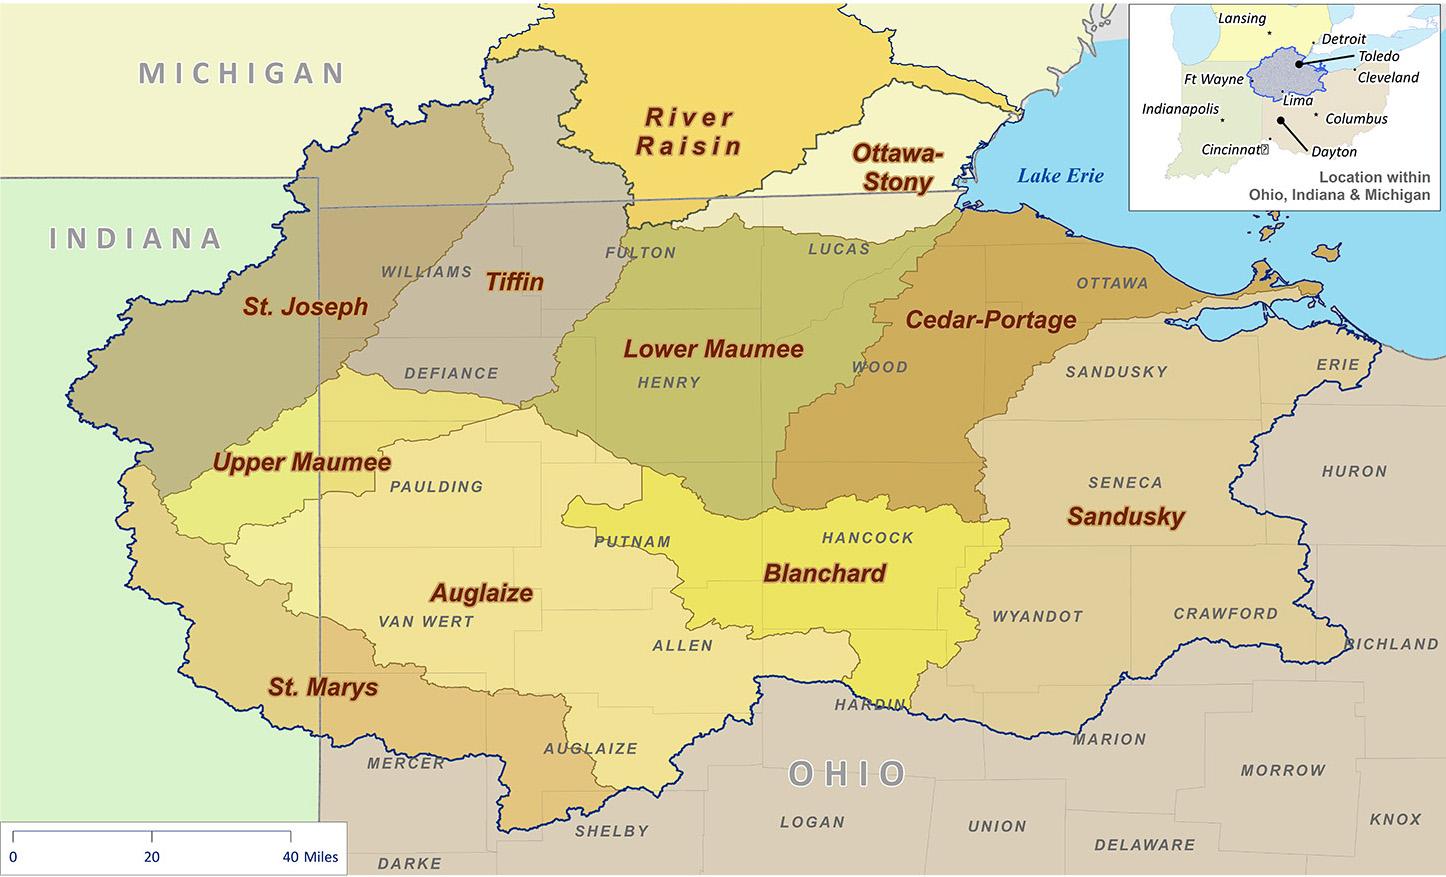 western lake erie map Western Lake Erie Basin Project Nrcs Ohio western lake erie map